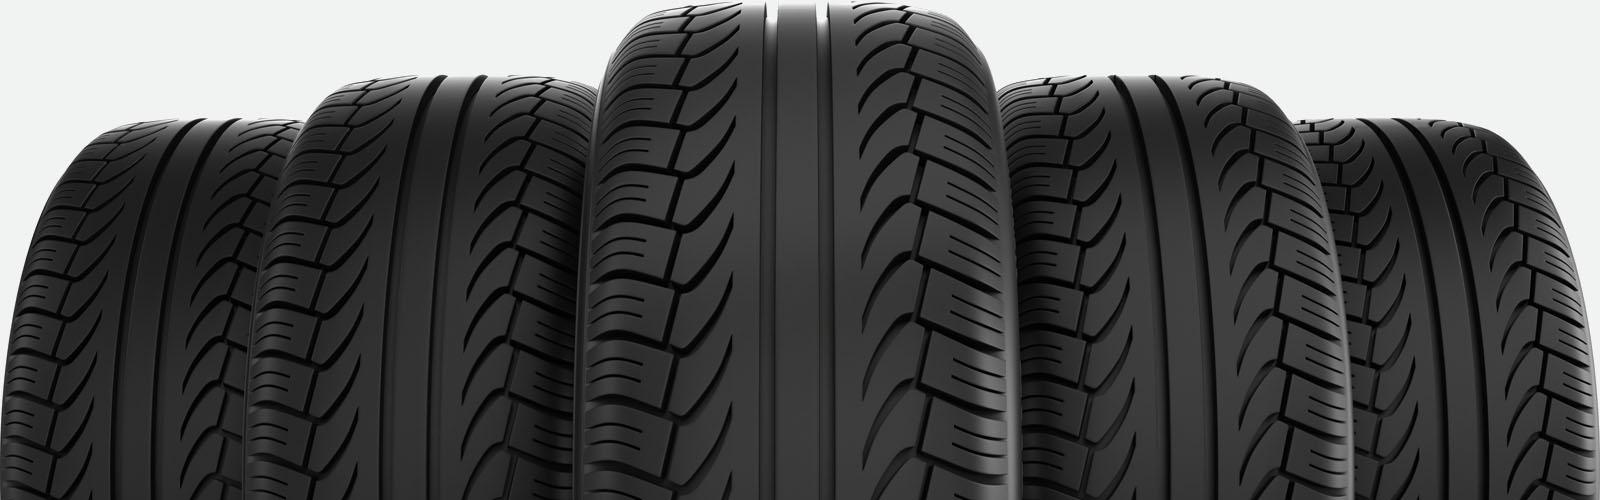 Compra tus neumáticos online